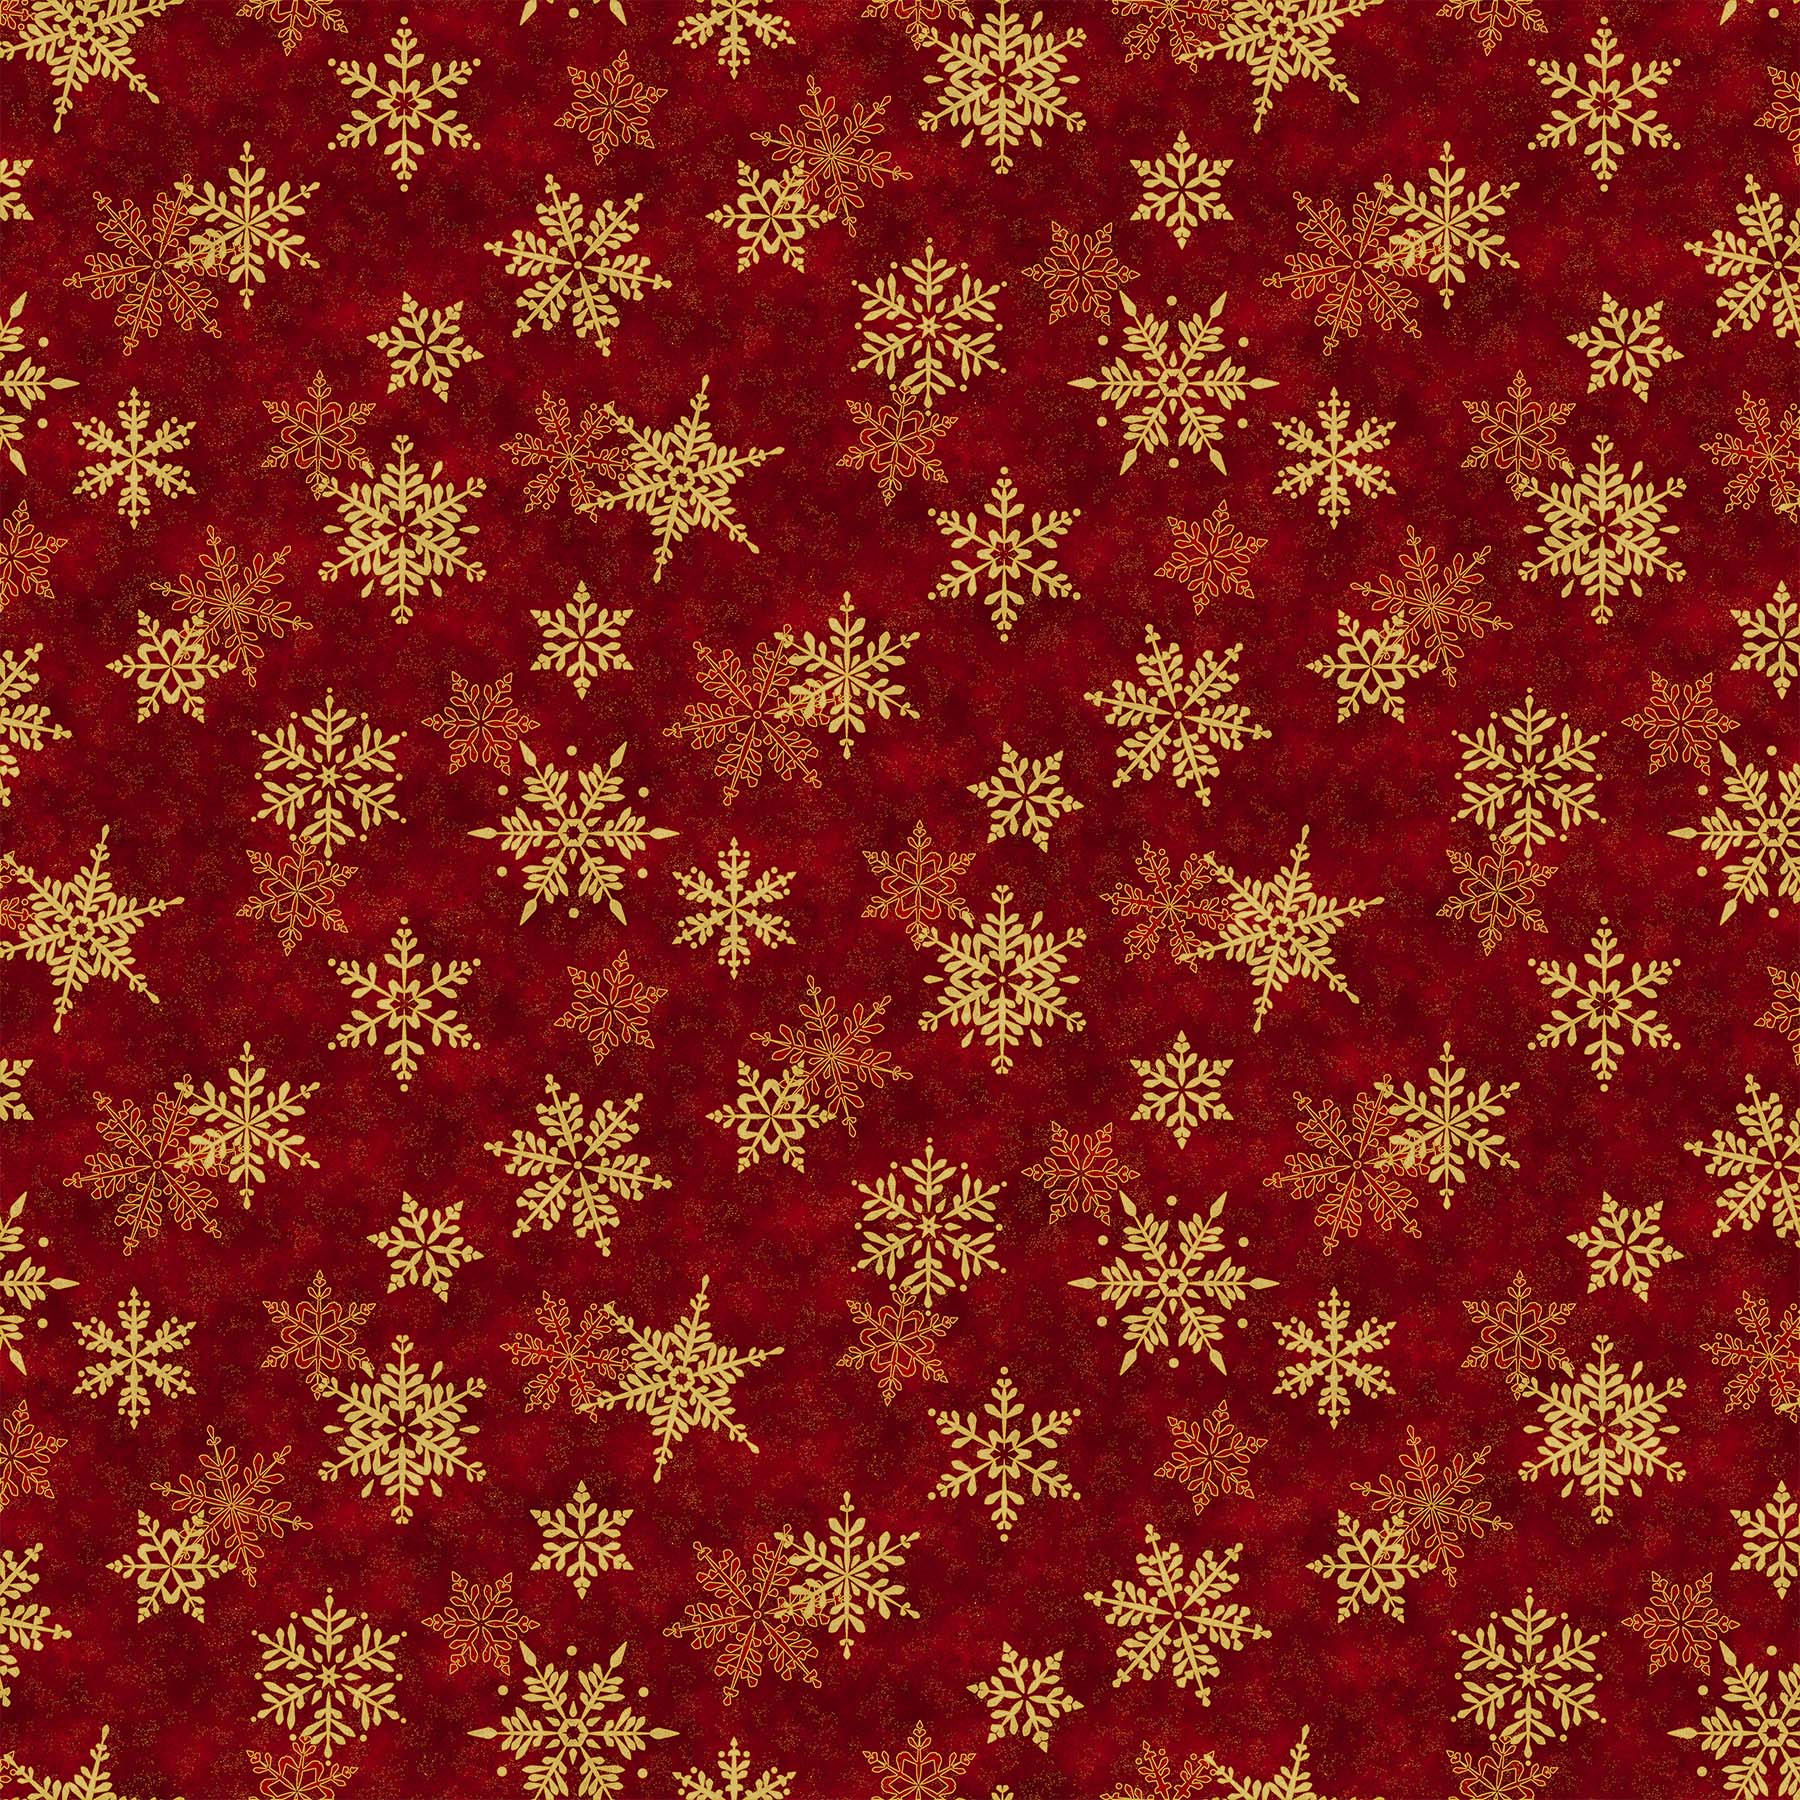 24195M-26 Winter Frost / Shimmer